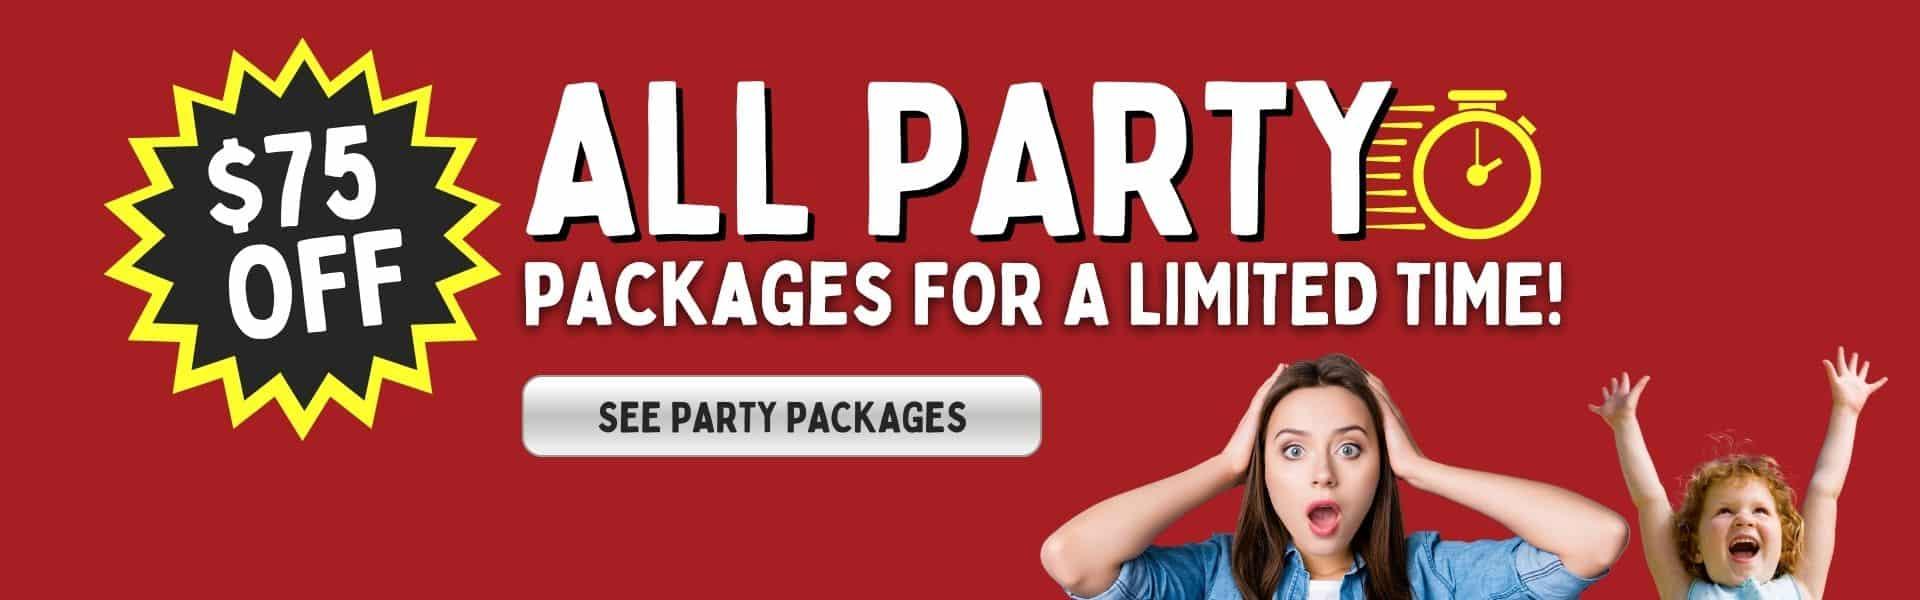 Website Banner - $75 OFF ALL PARTIES (2)